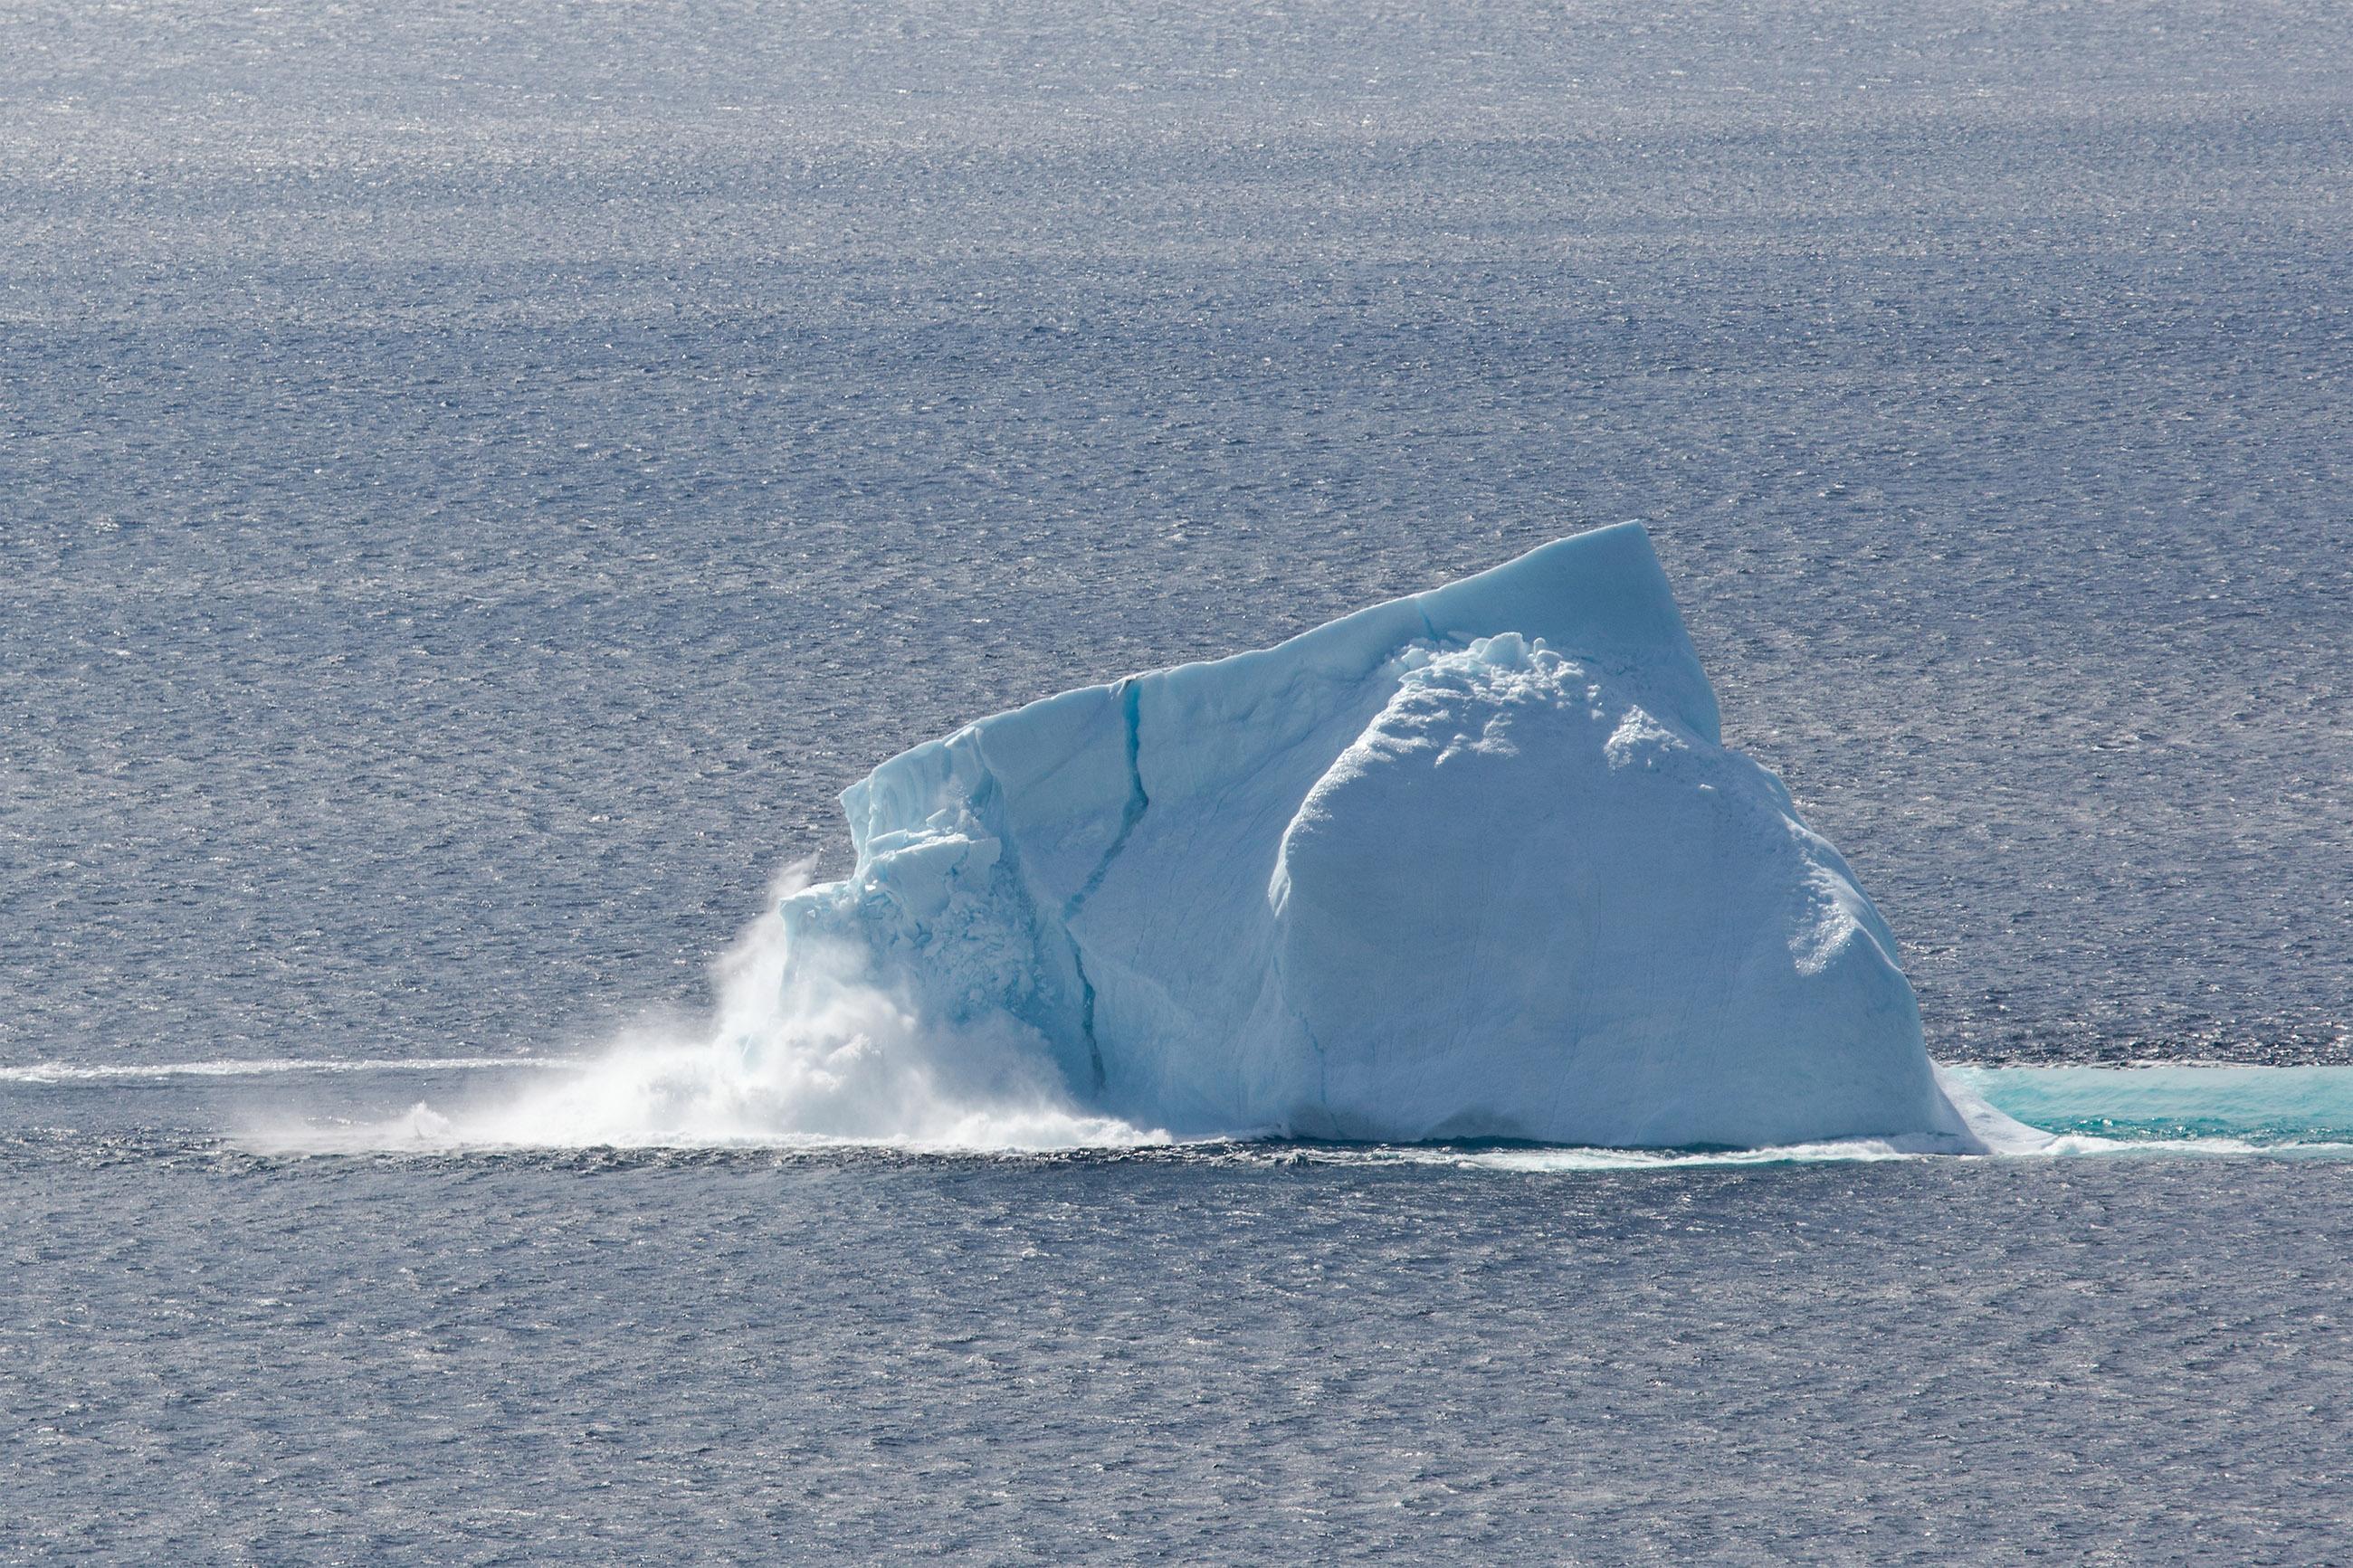 Collapsing iceberg photo